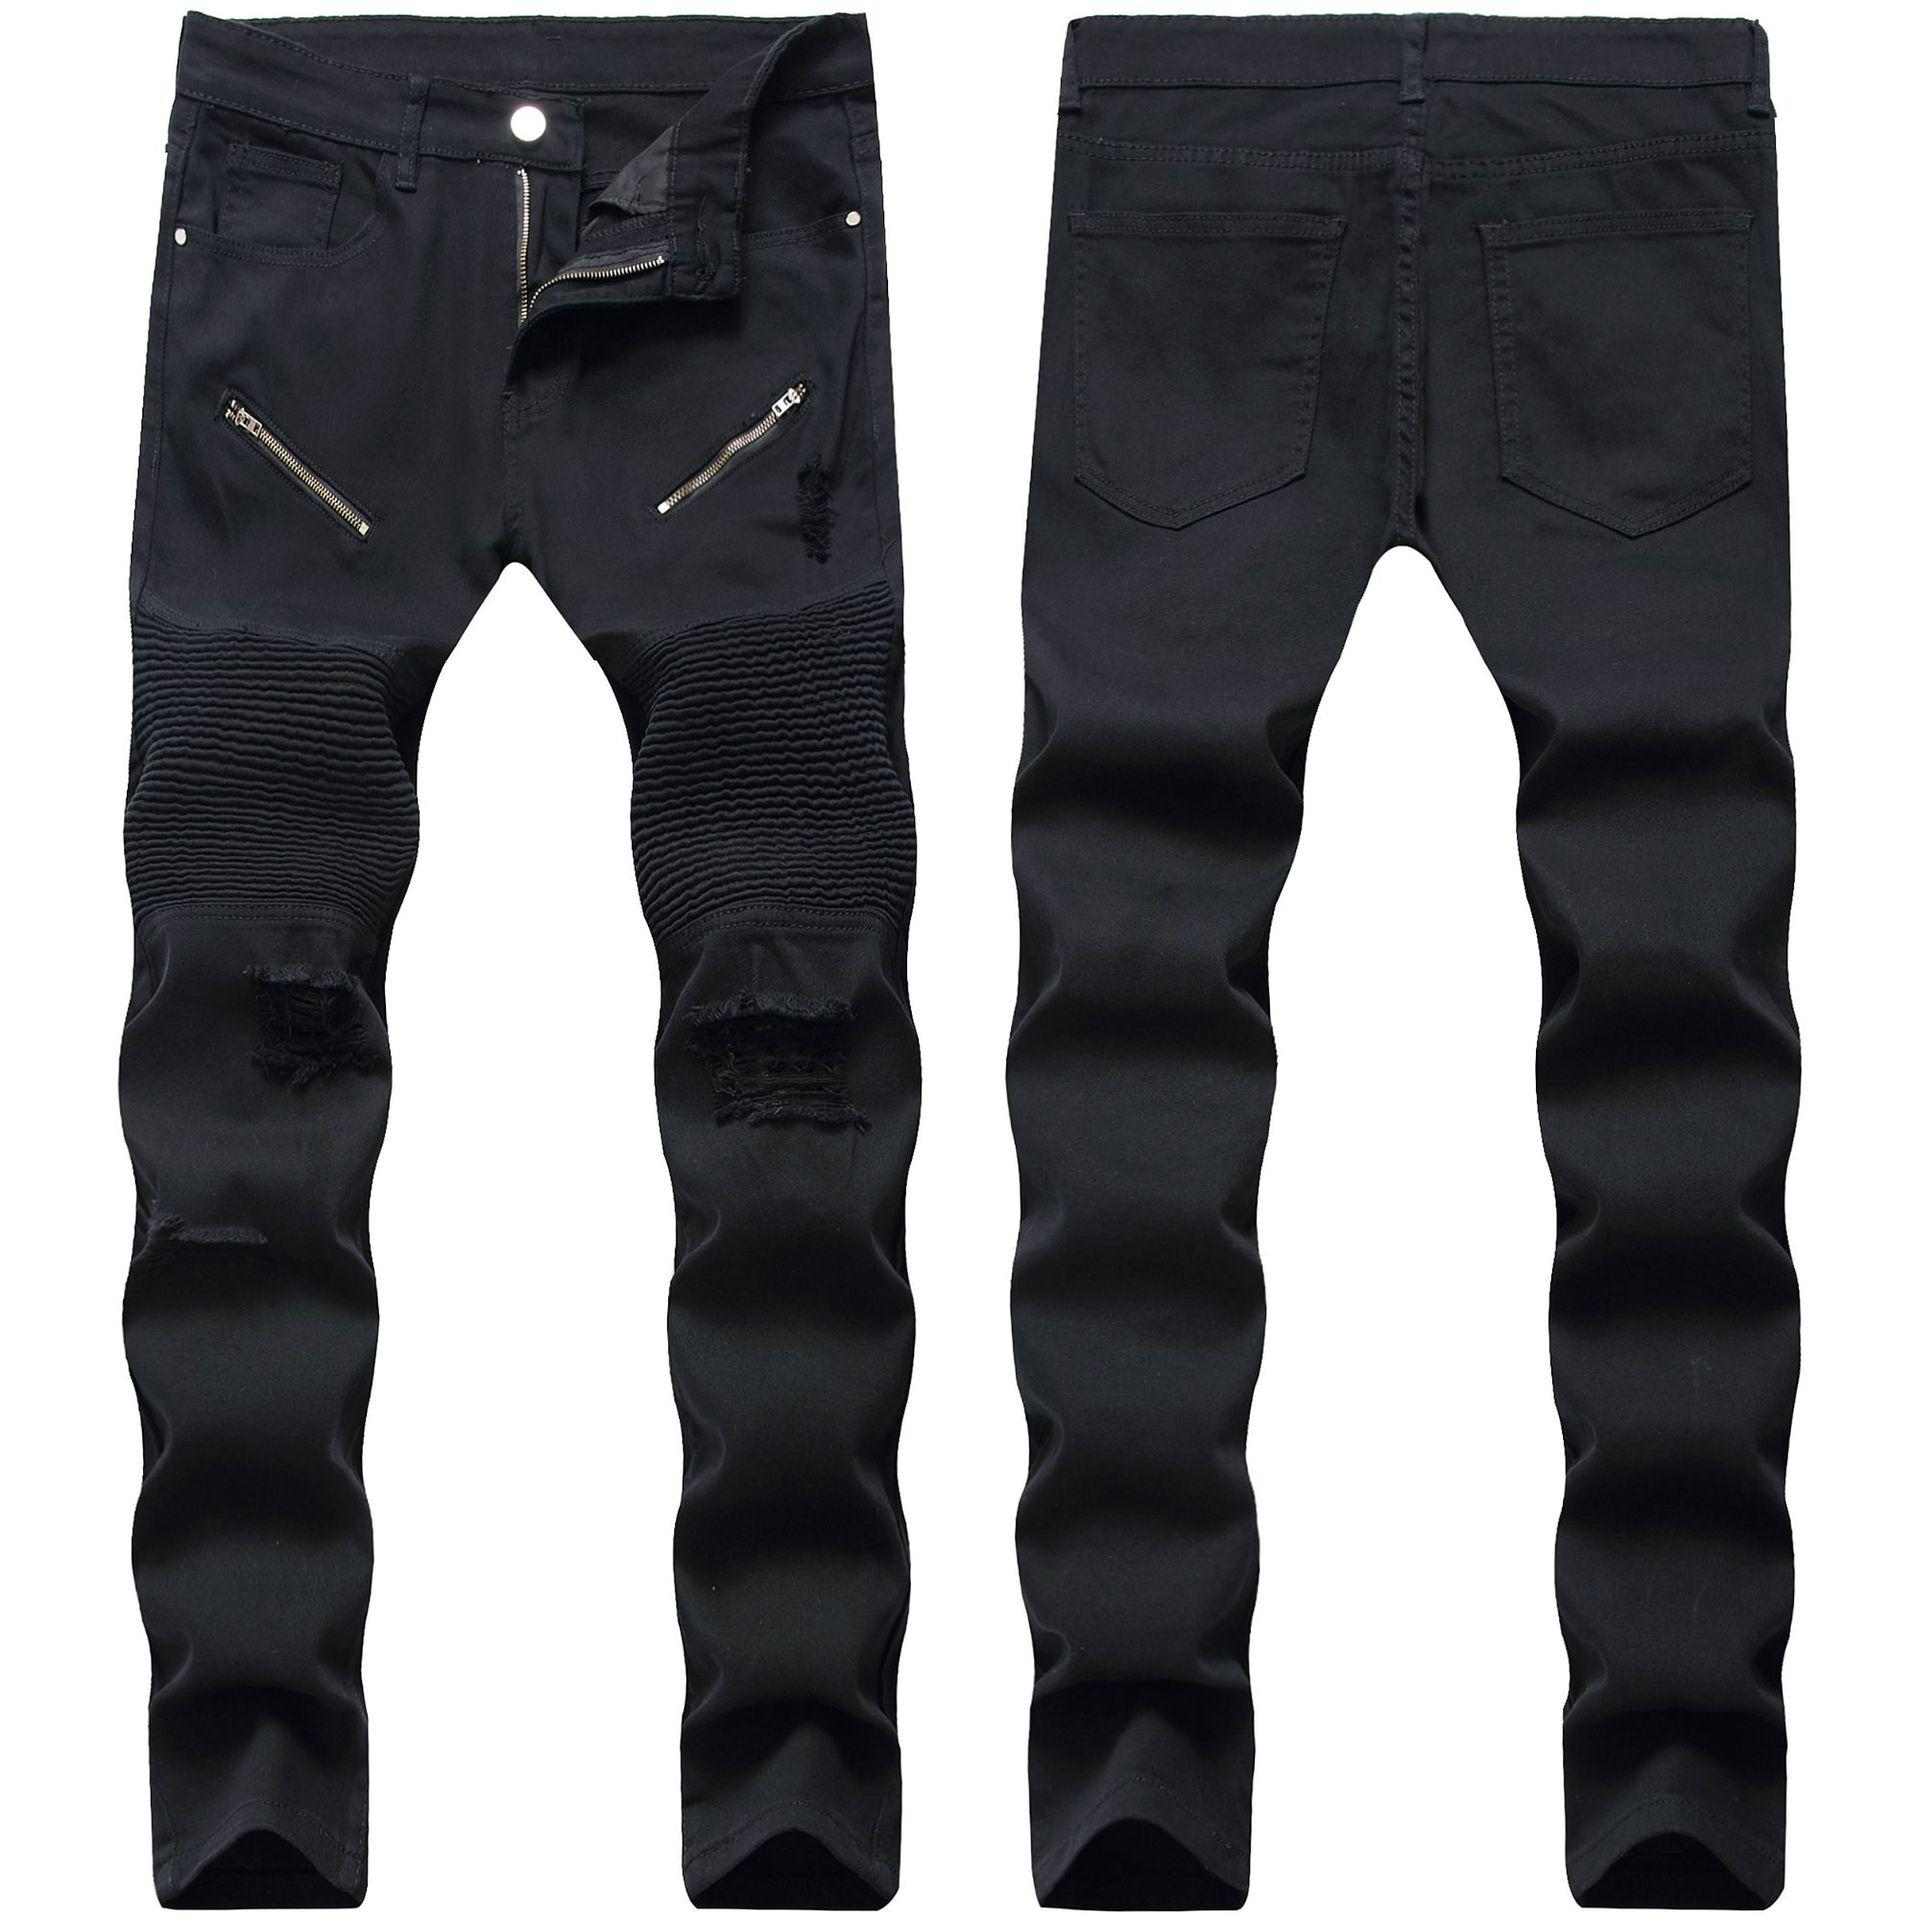 Skinny Mens Black Jeans Cool Men Jeans Stretch Syl fit Denim Biker Jeans Hip Hop Men Streetwear 2018 #